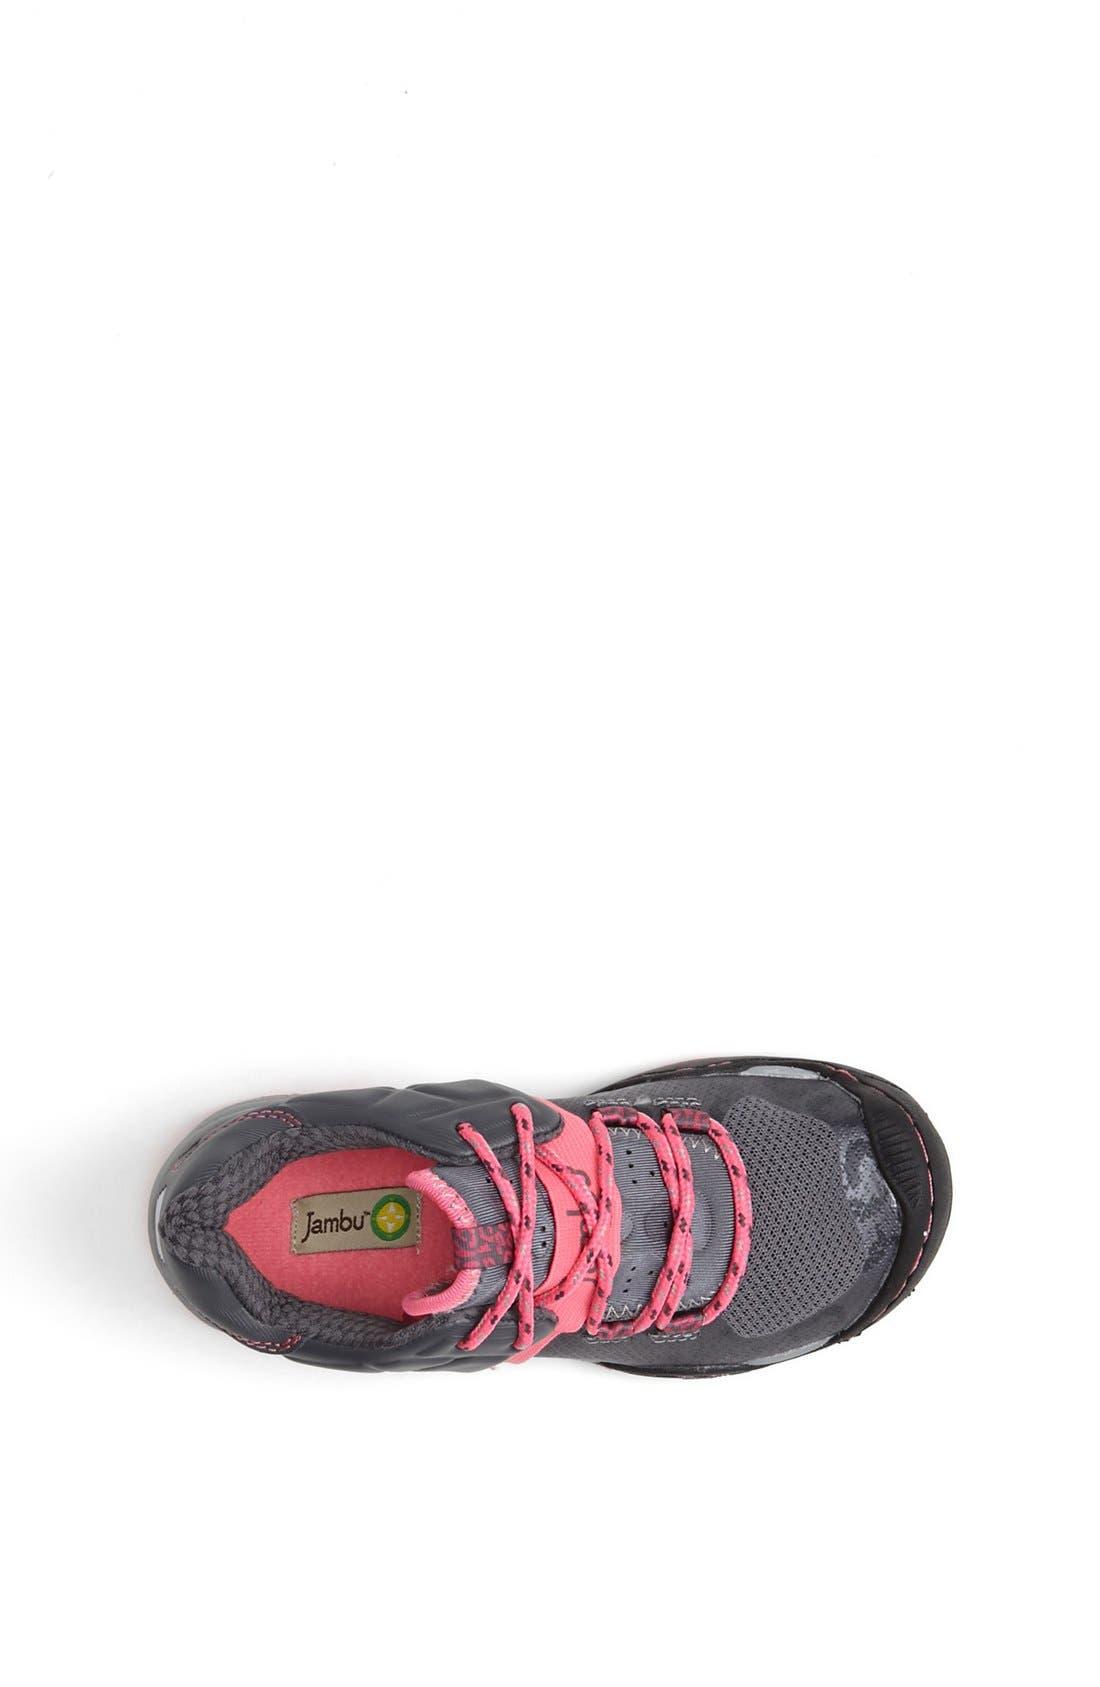 Alternate Image 2  - Jambu 'Agami' Sneaker (Toddler, Little Kid & Big Kid)